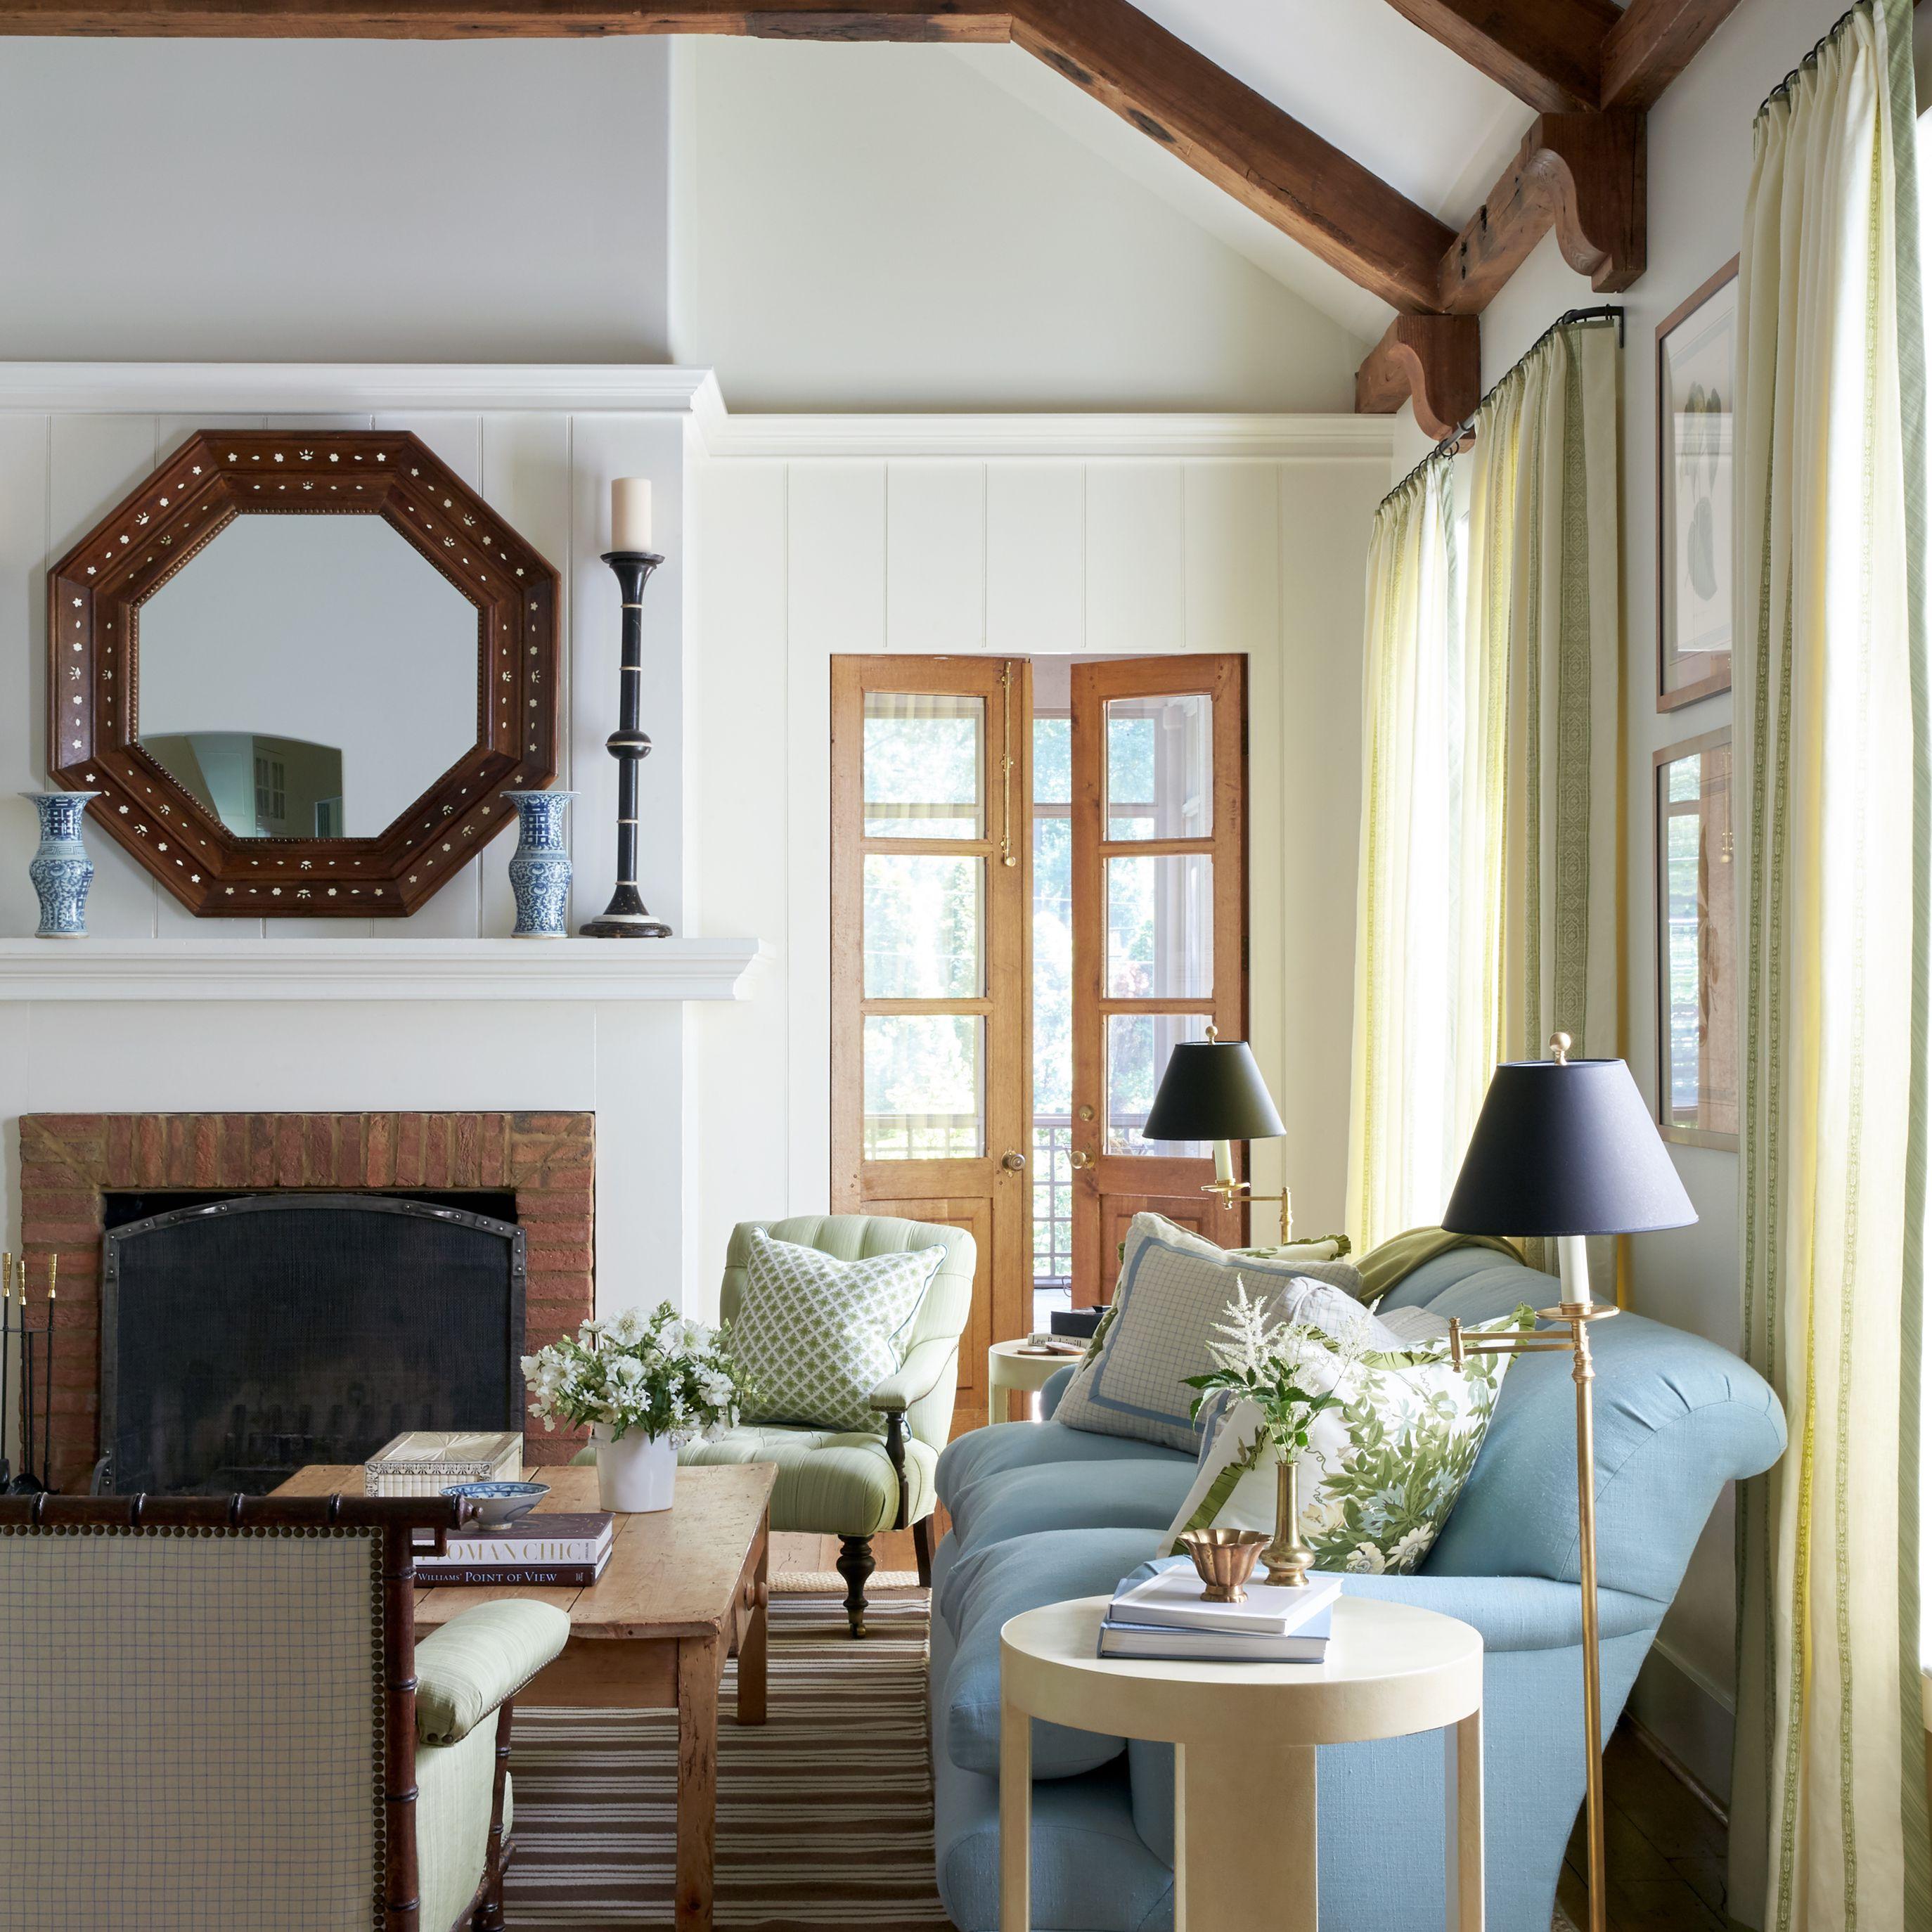 sala de estar con techo de vigas de madera oscura